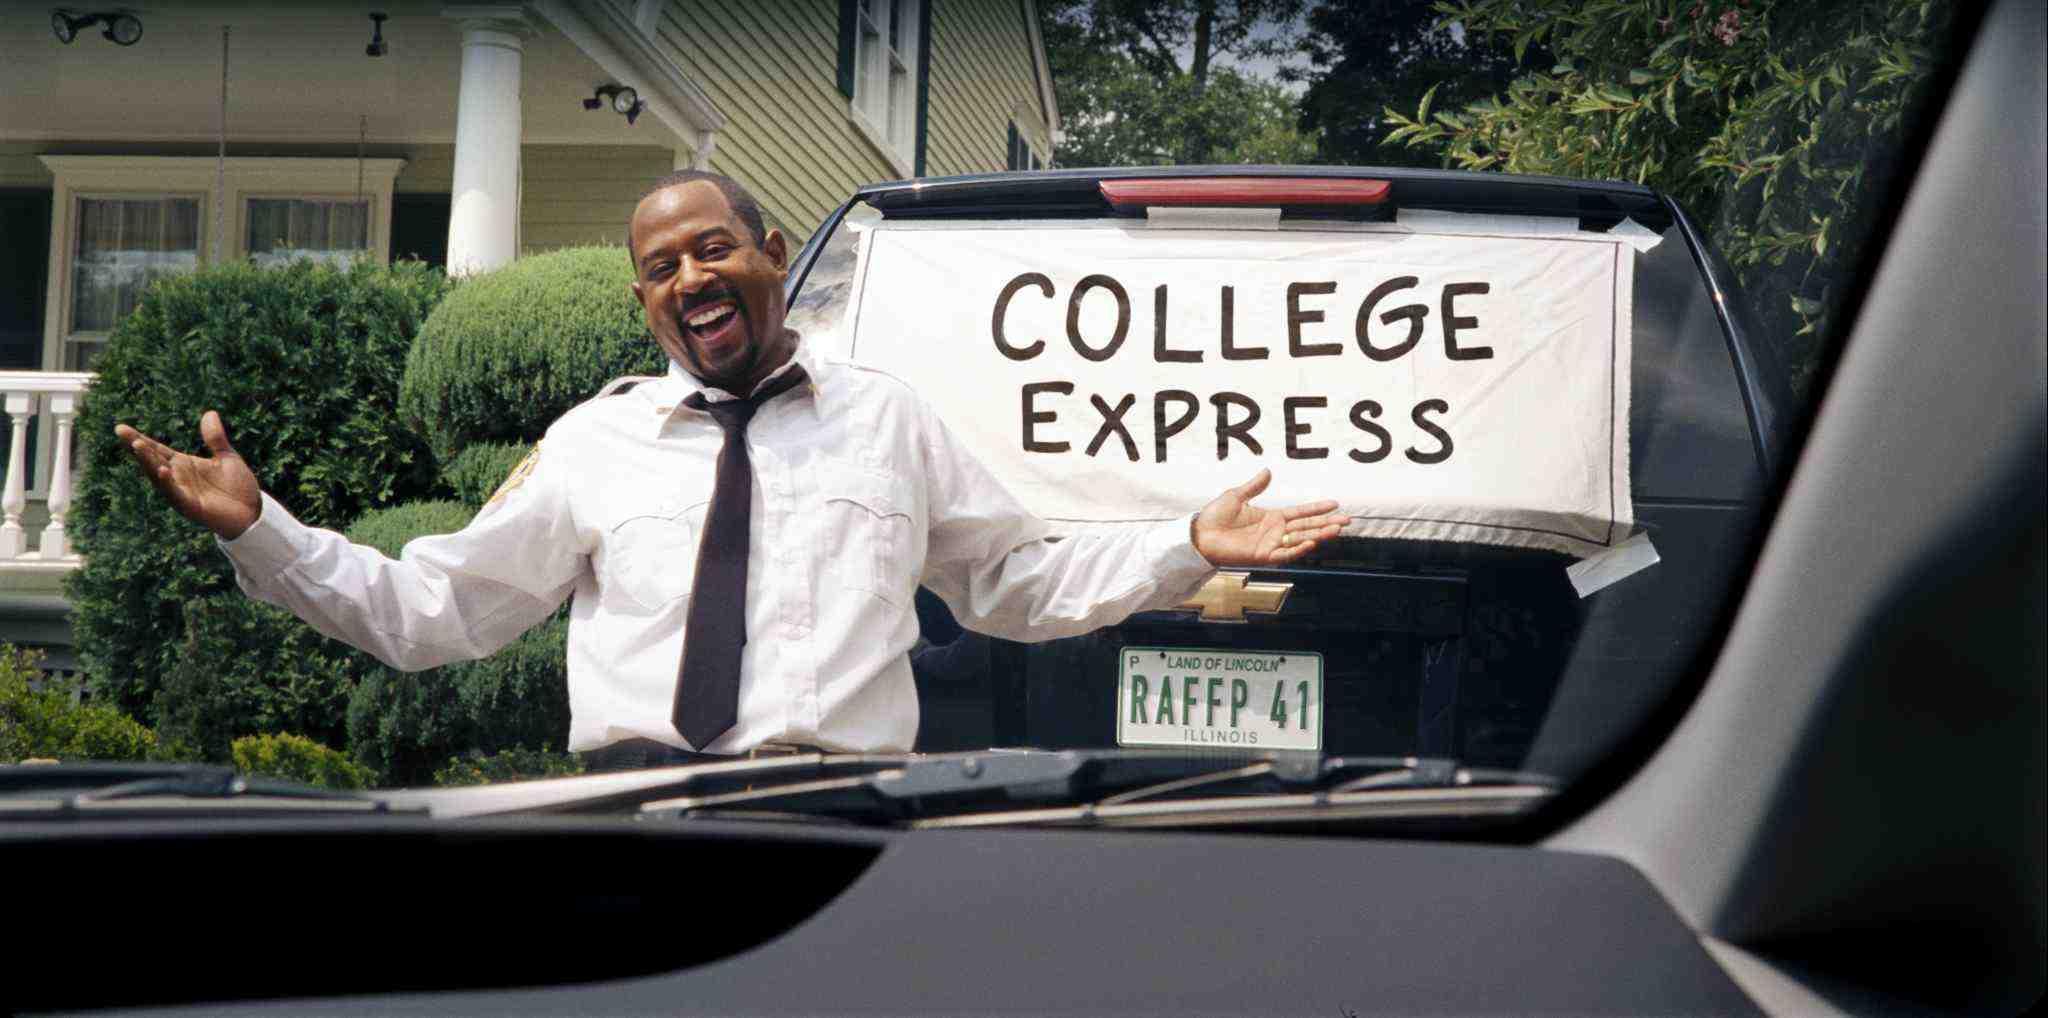 College Road Trip Clipart#1877019.